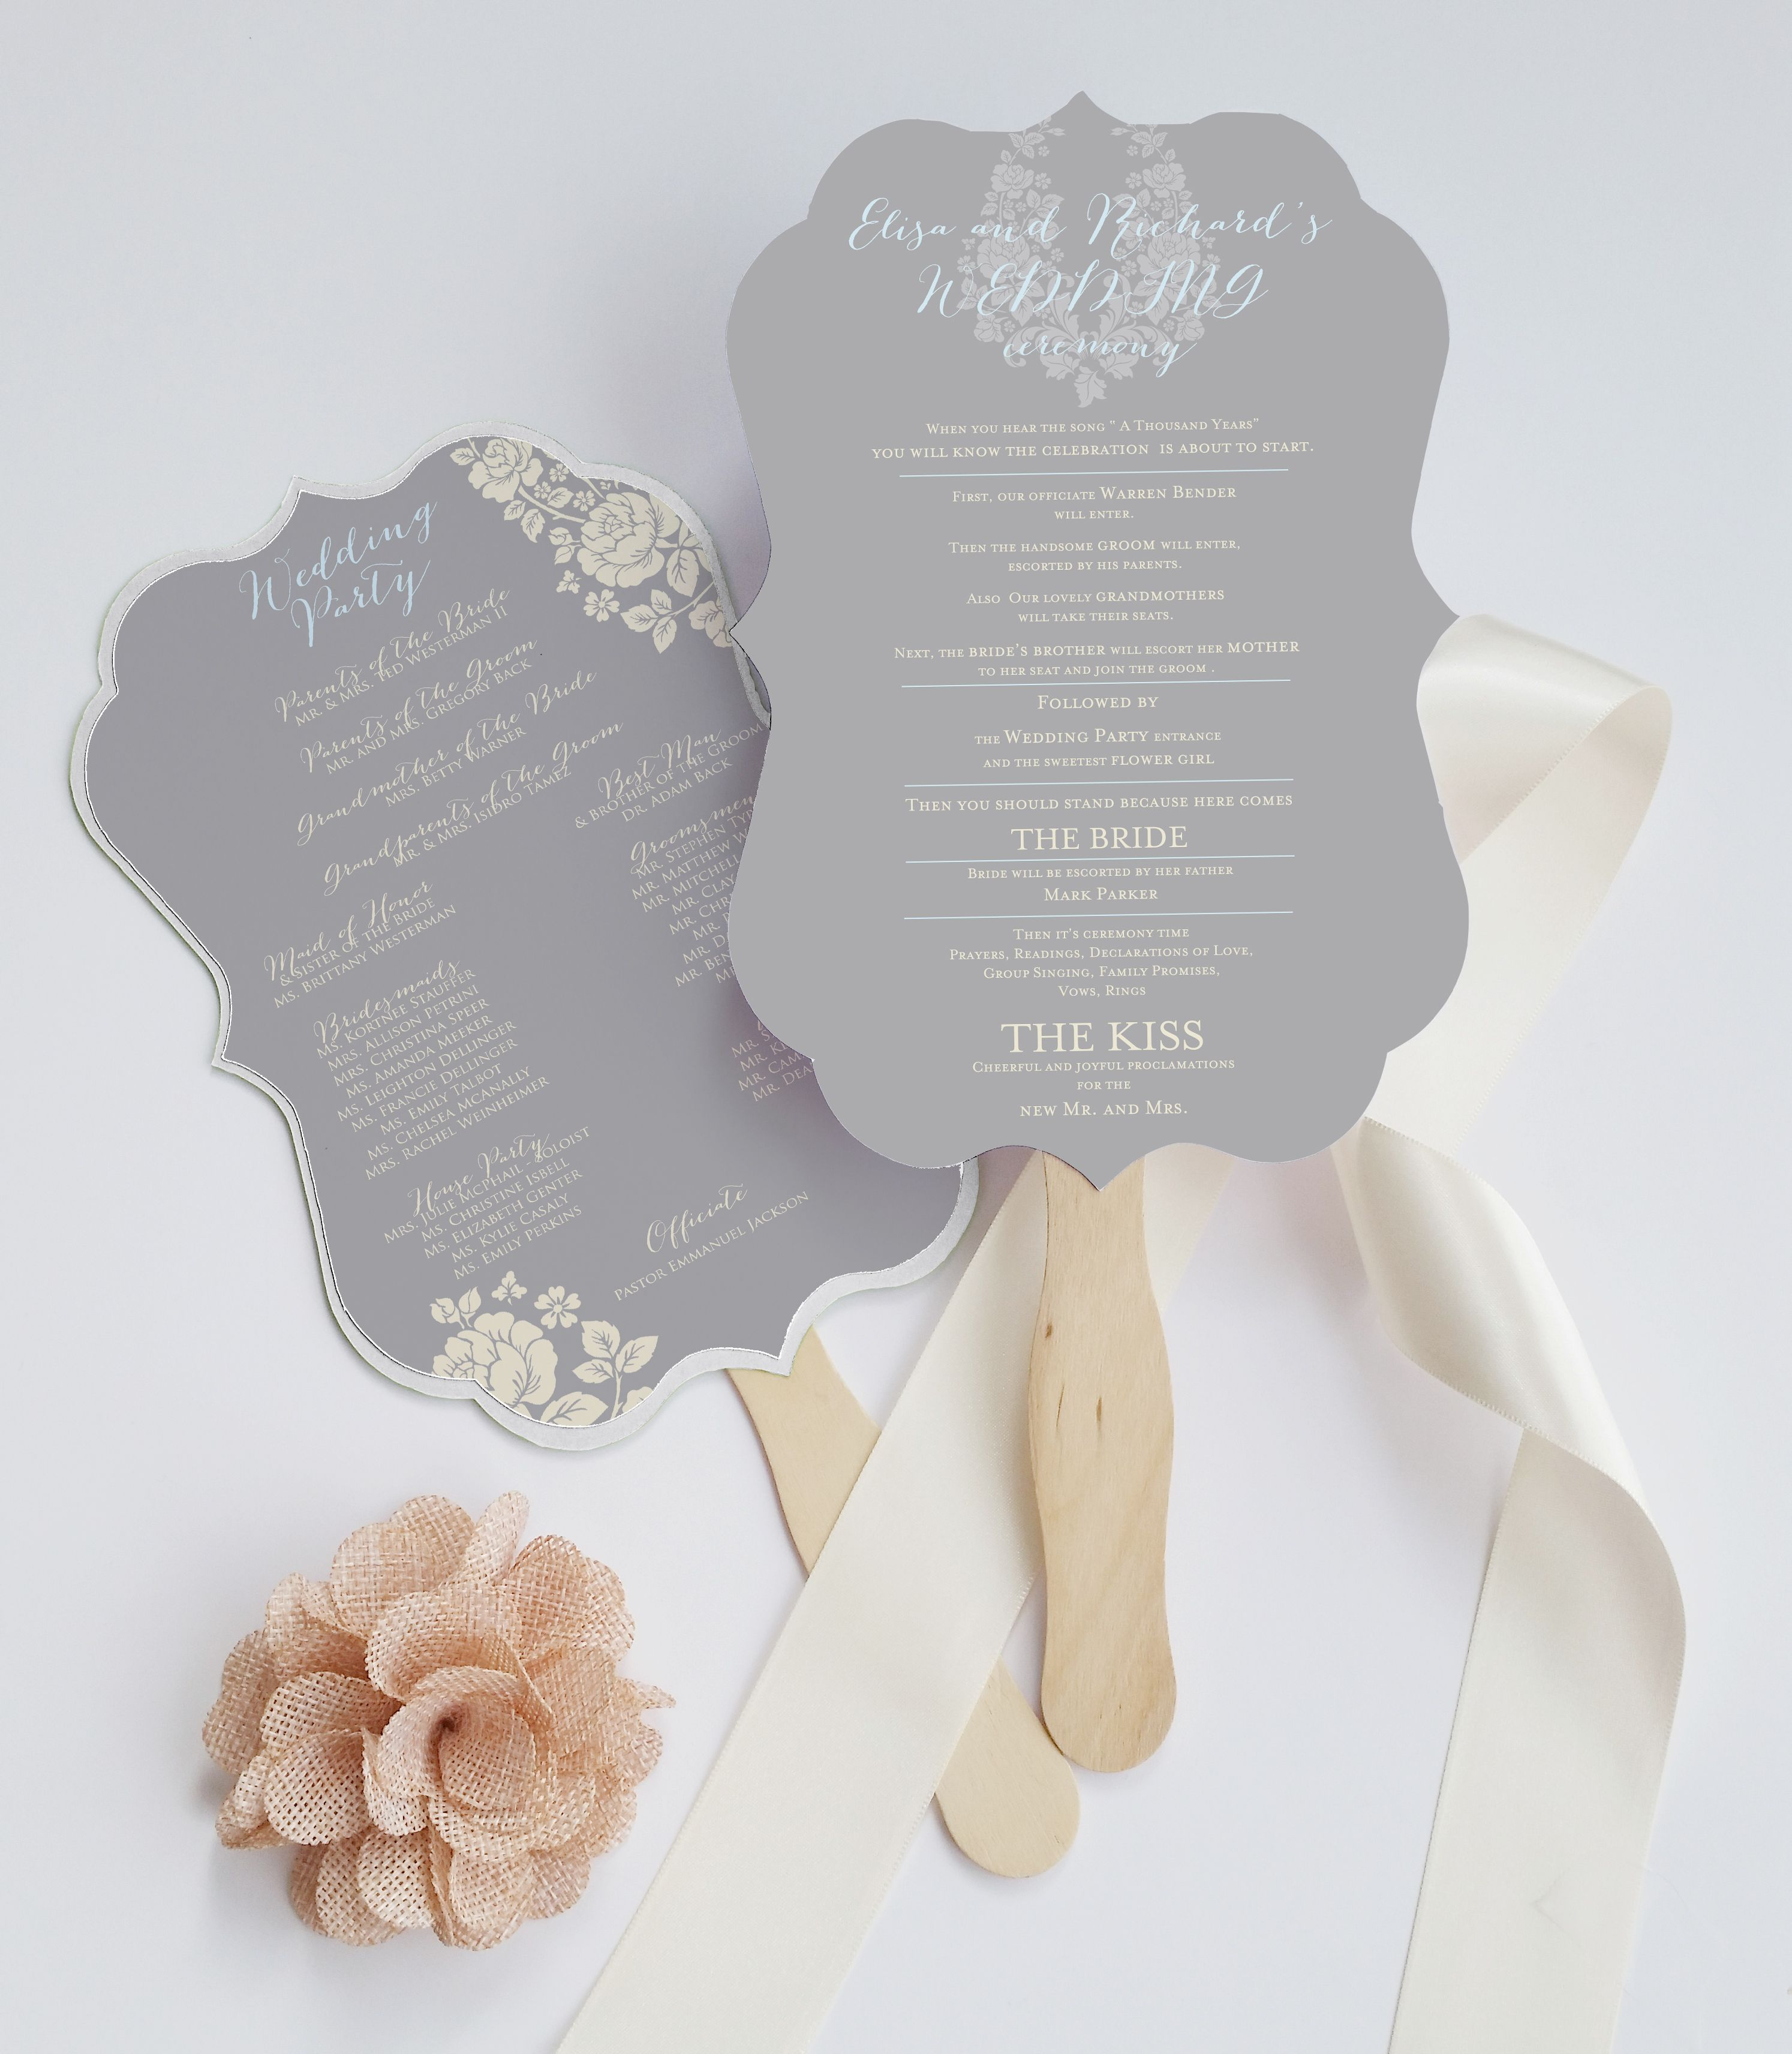 Die cut wedding program fan deersfield grey cream ornamental die cut wedding program fan deersfield grey cream ornamental die cut solutioingenieria Choice Image